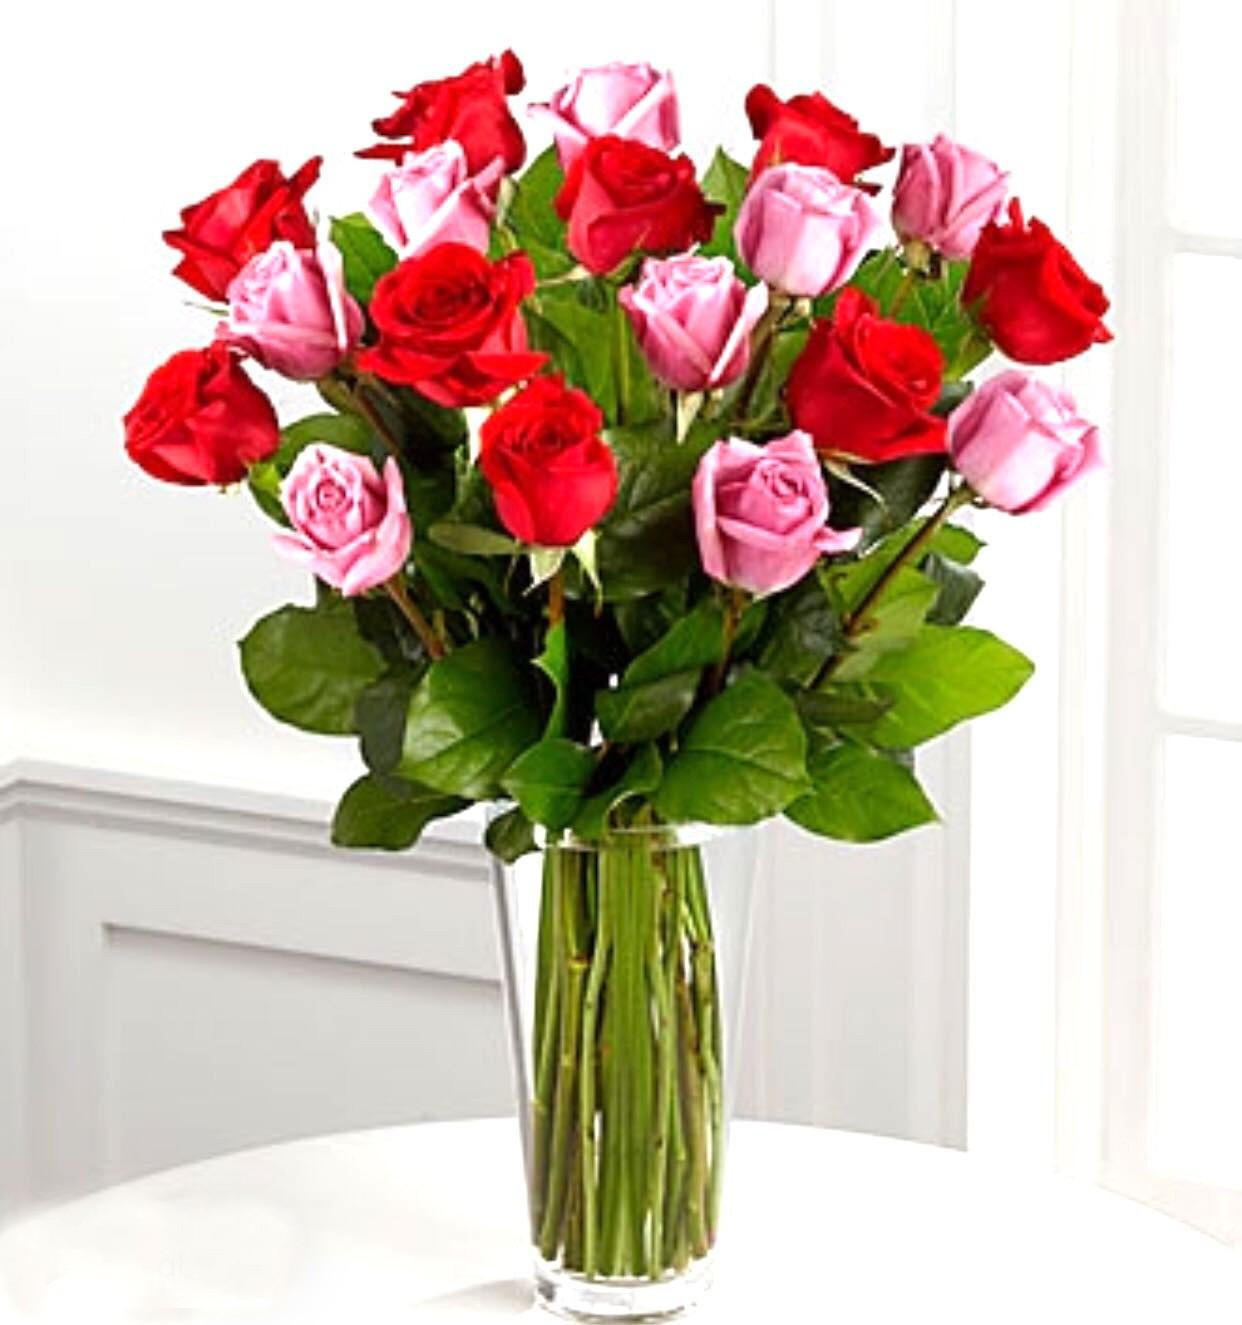 cheap white bud vases of 16 best of flowers pink roses color pictures ezba wallpaper for flowers pink roses color pictures fresh pink roses with wax flowerh vases in a vase floweri